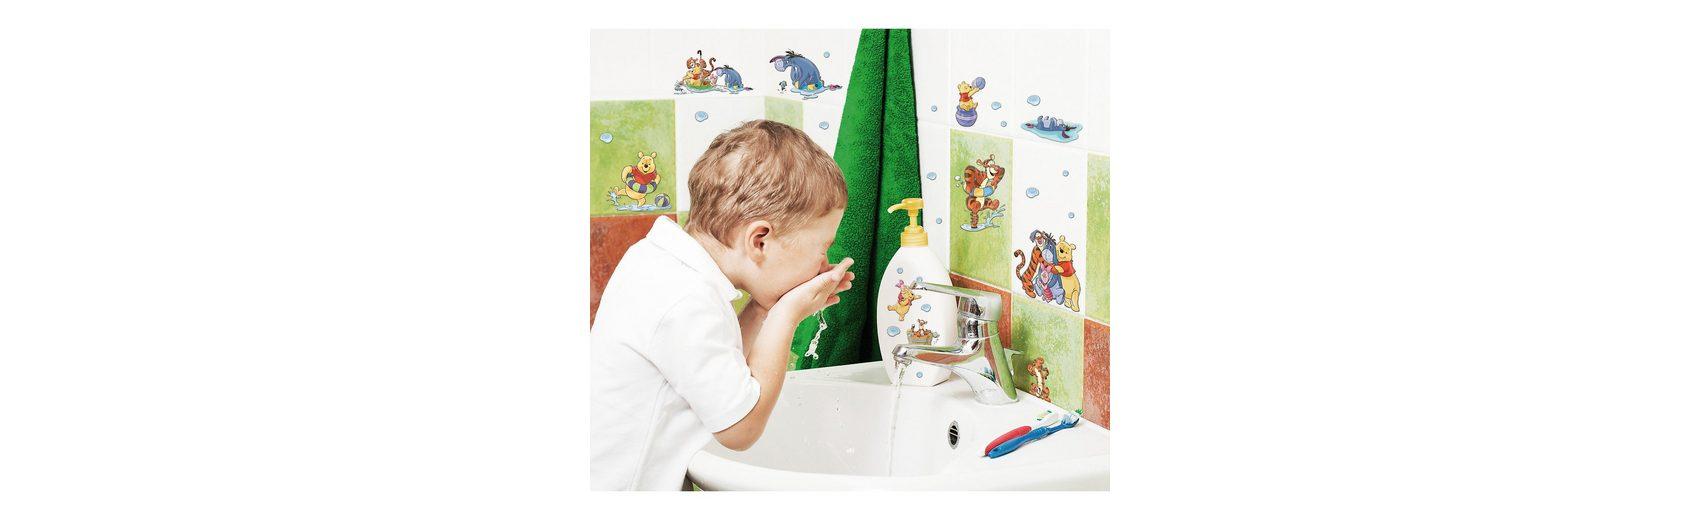 Sticker Creative Winnie the Pooh, Water Play, 40-tlg.